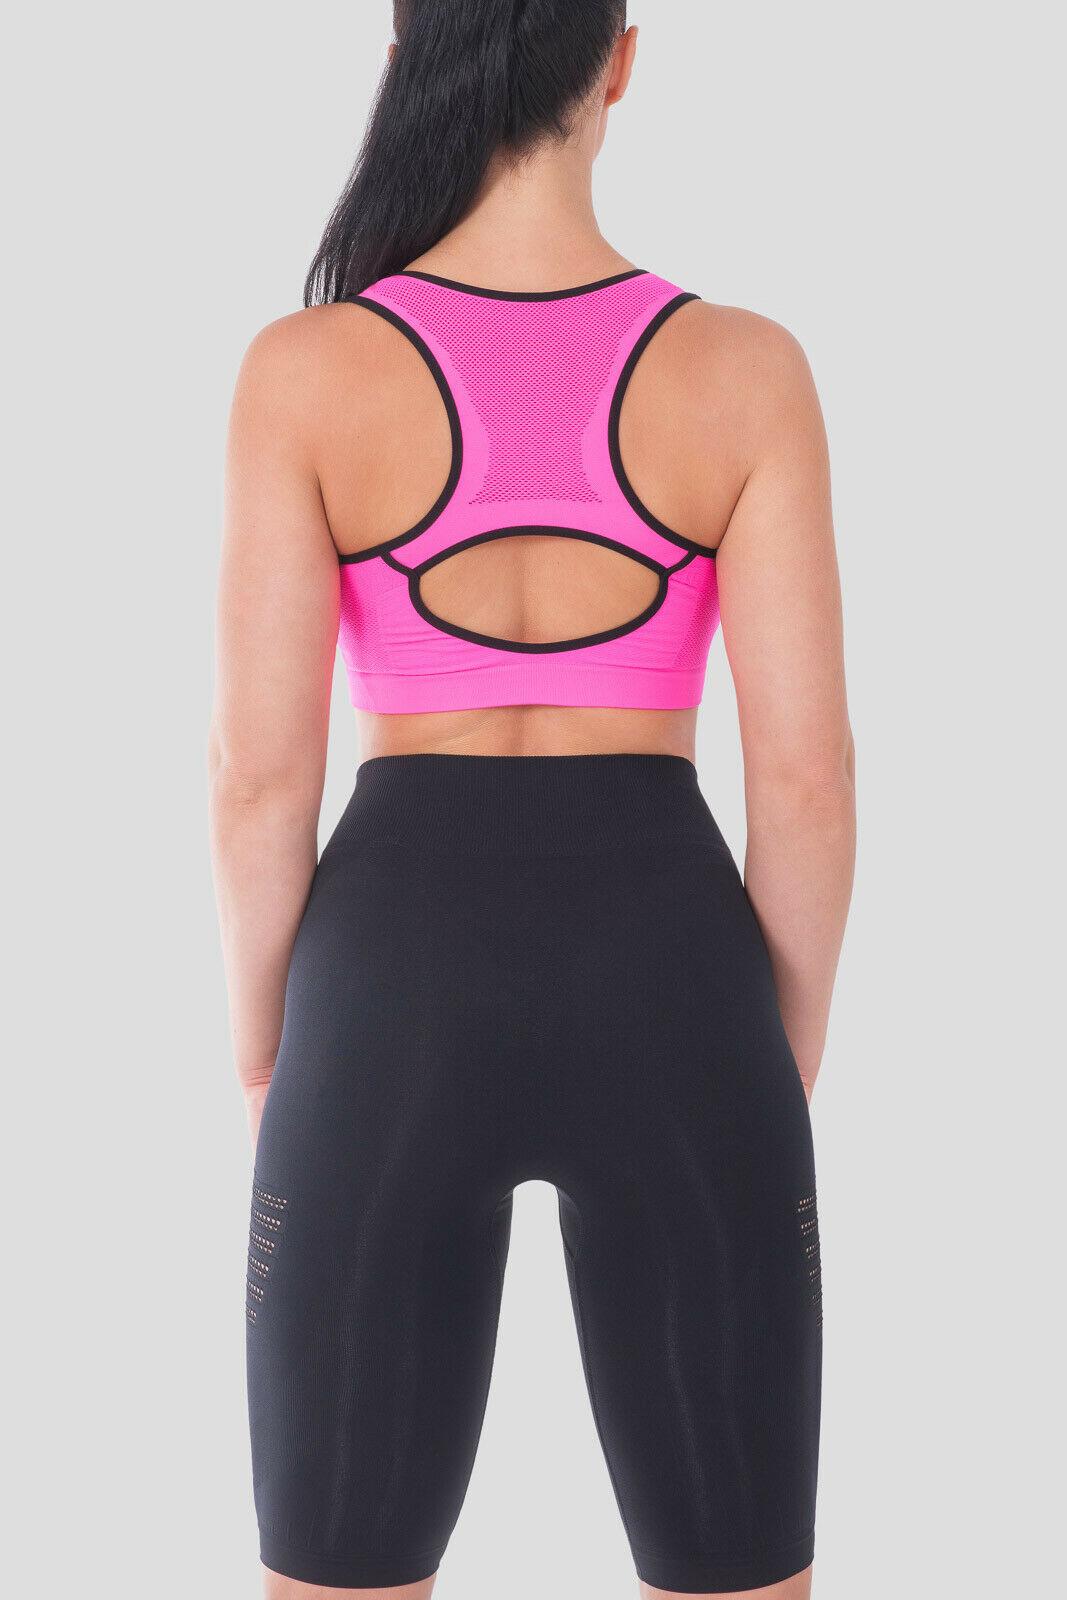 Bellissima-Women-039-s-Sport-Bra-Running-Yoga-Workout-Fitness-Racerback-Seamless thumbnail 45